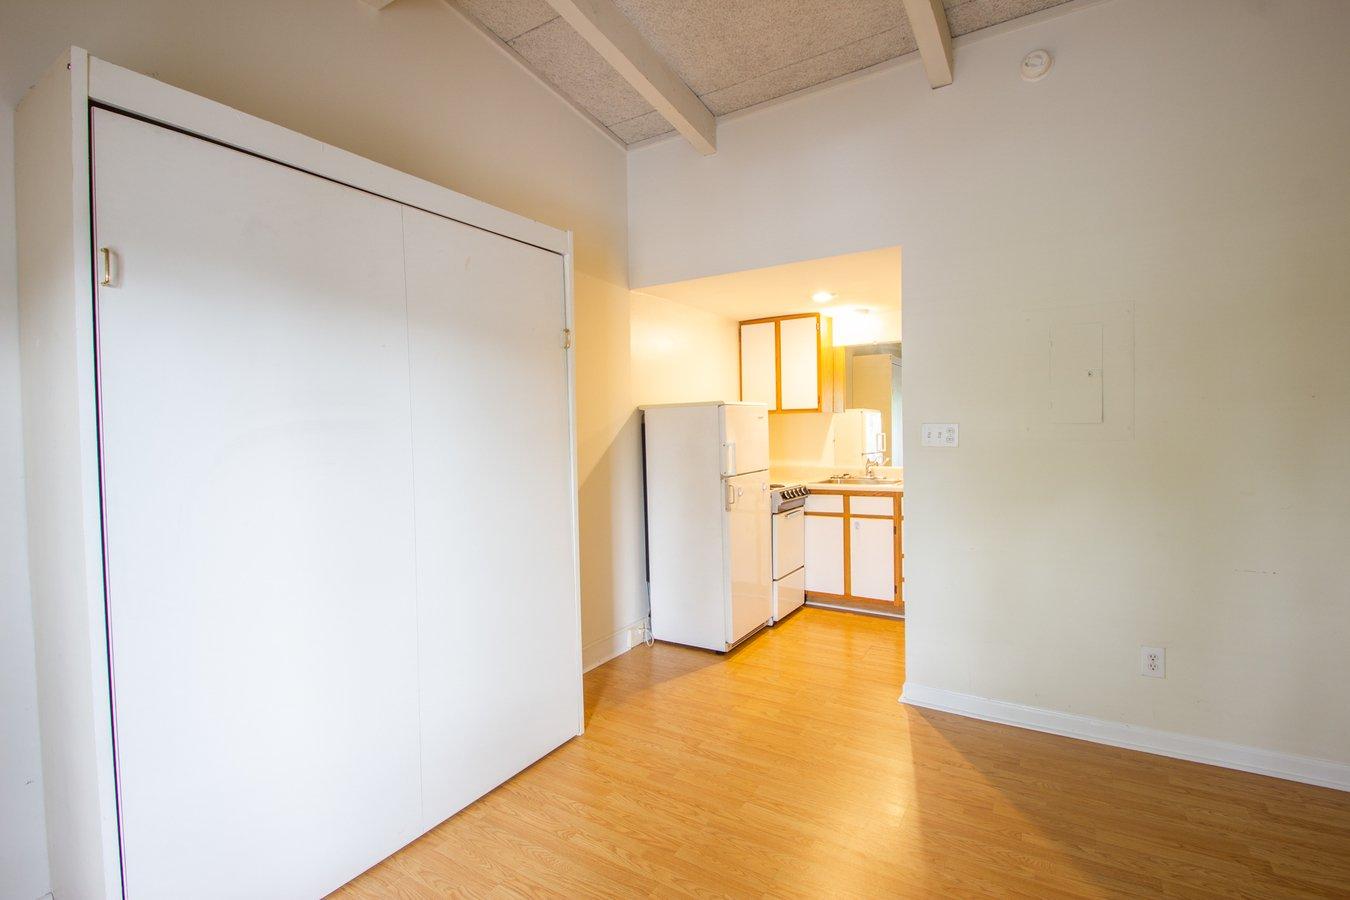 Studio 1 Bathroom Apartment for rent at Scholar's Rock Studio Apartments in Bloomington, IN